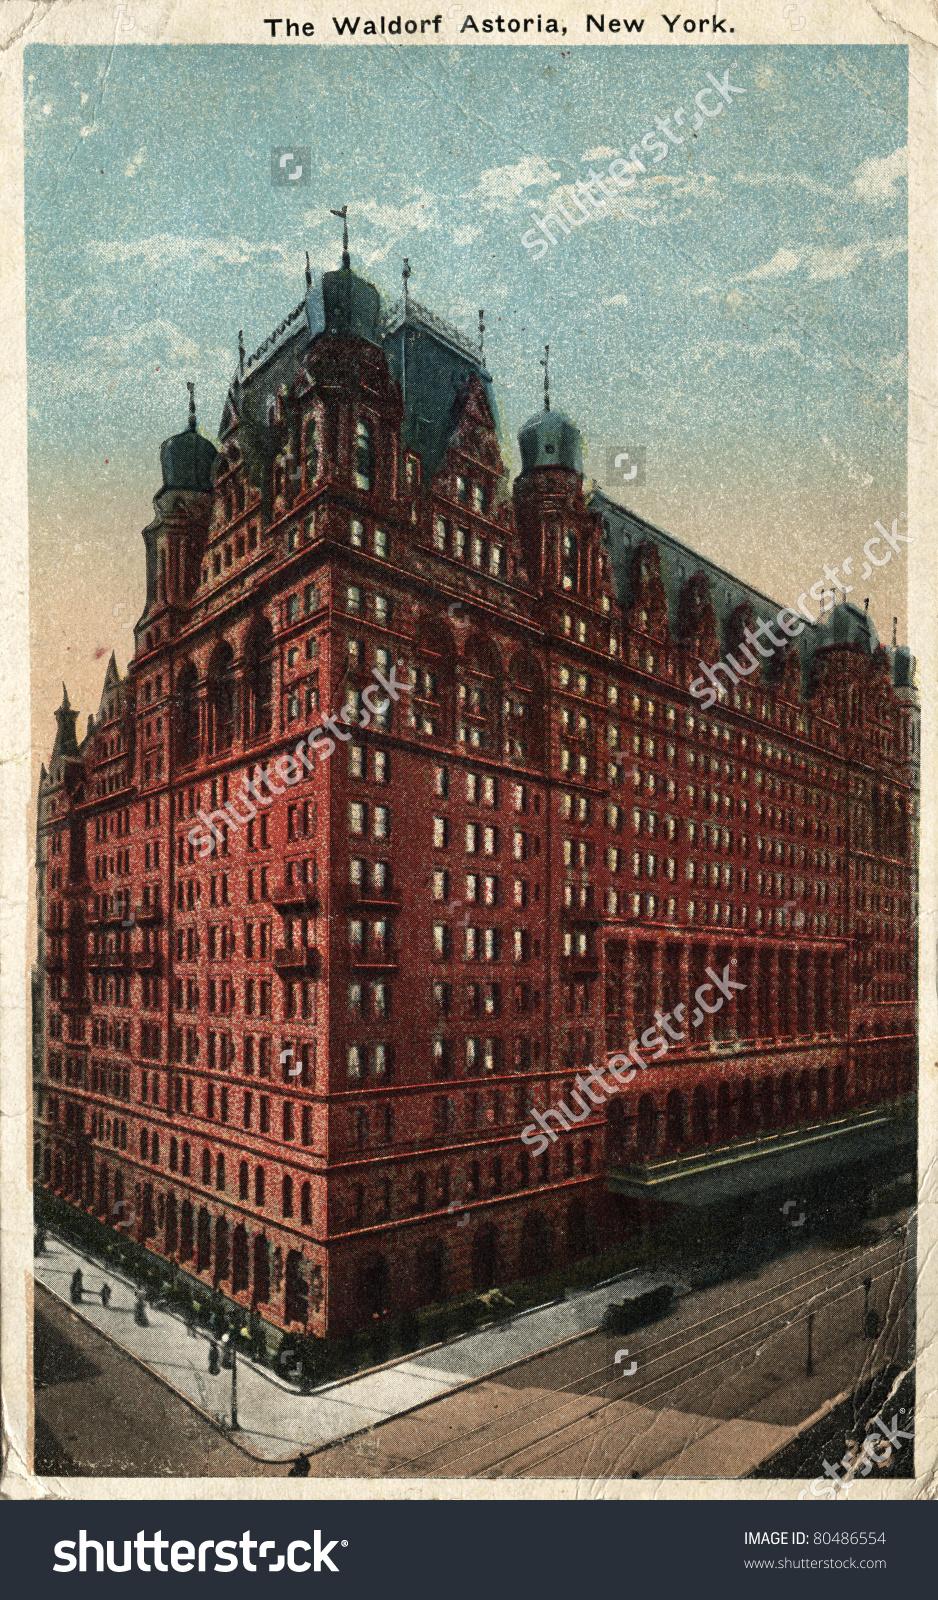 Astoria hotel clipart #3